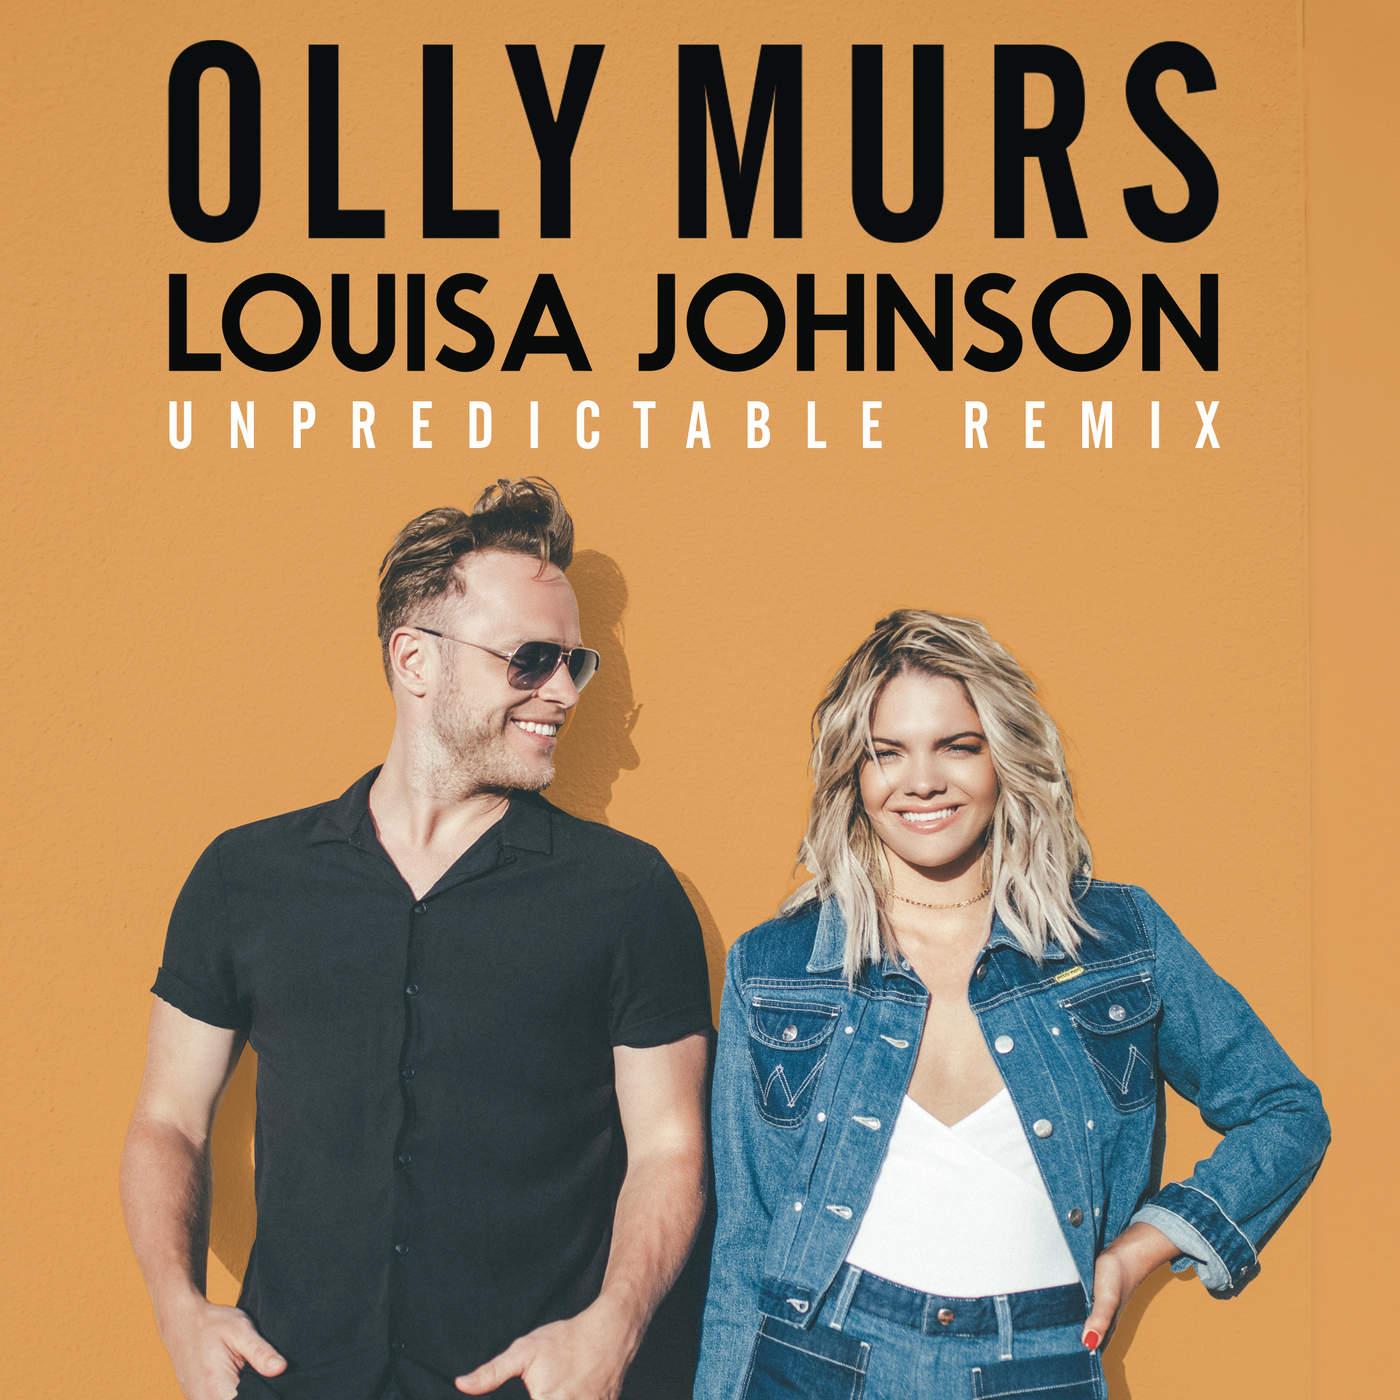 Olly Murs - Unpredictable (John Gibbons Remix) - Single Cover